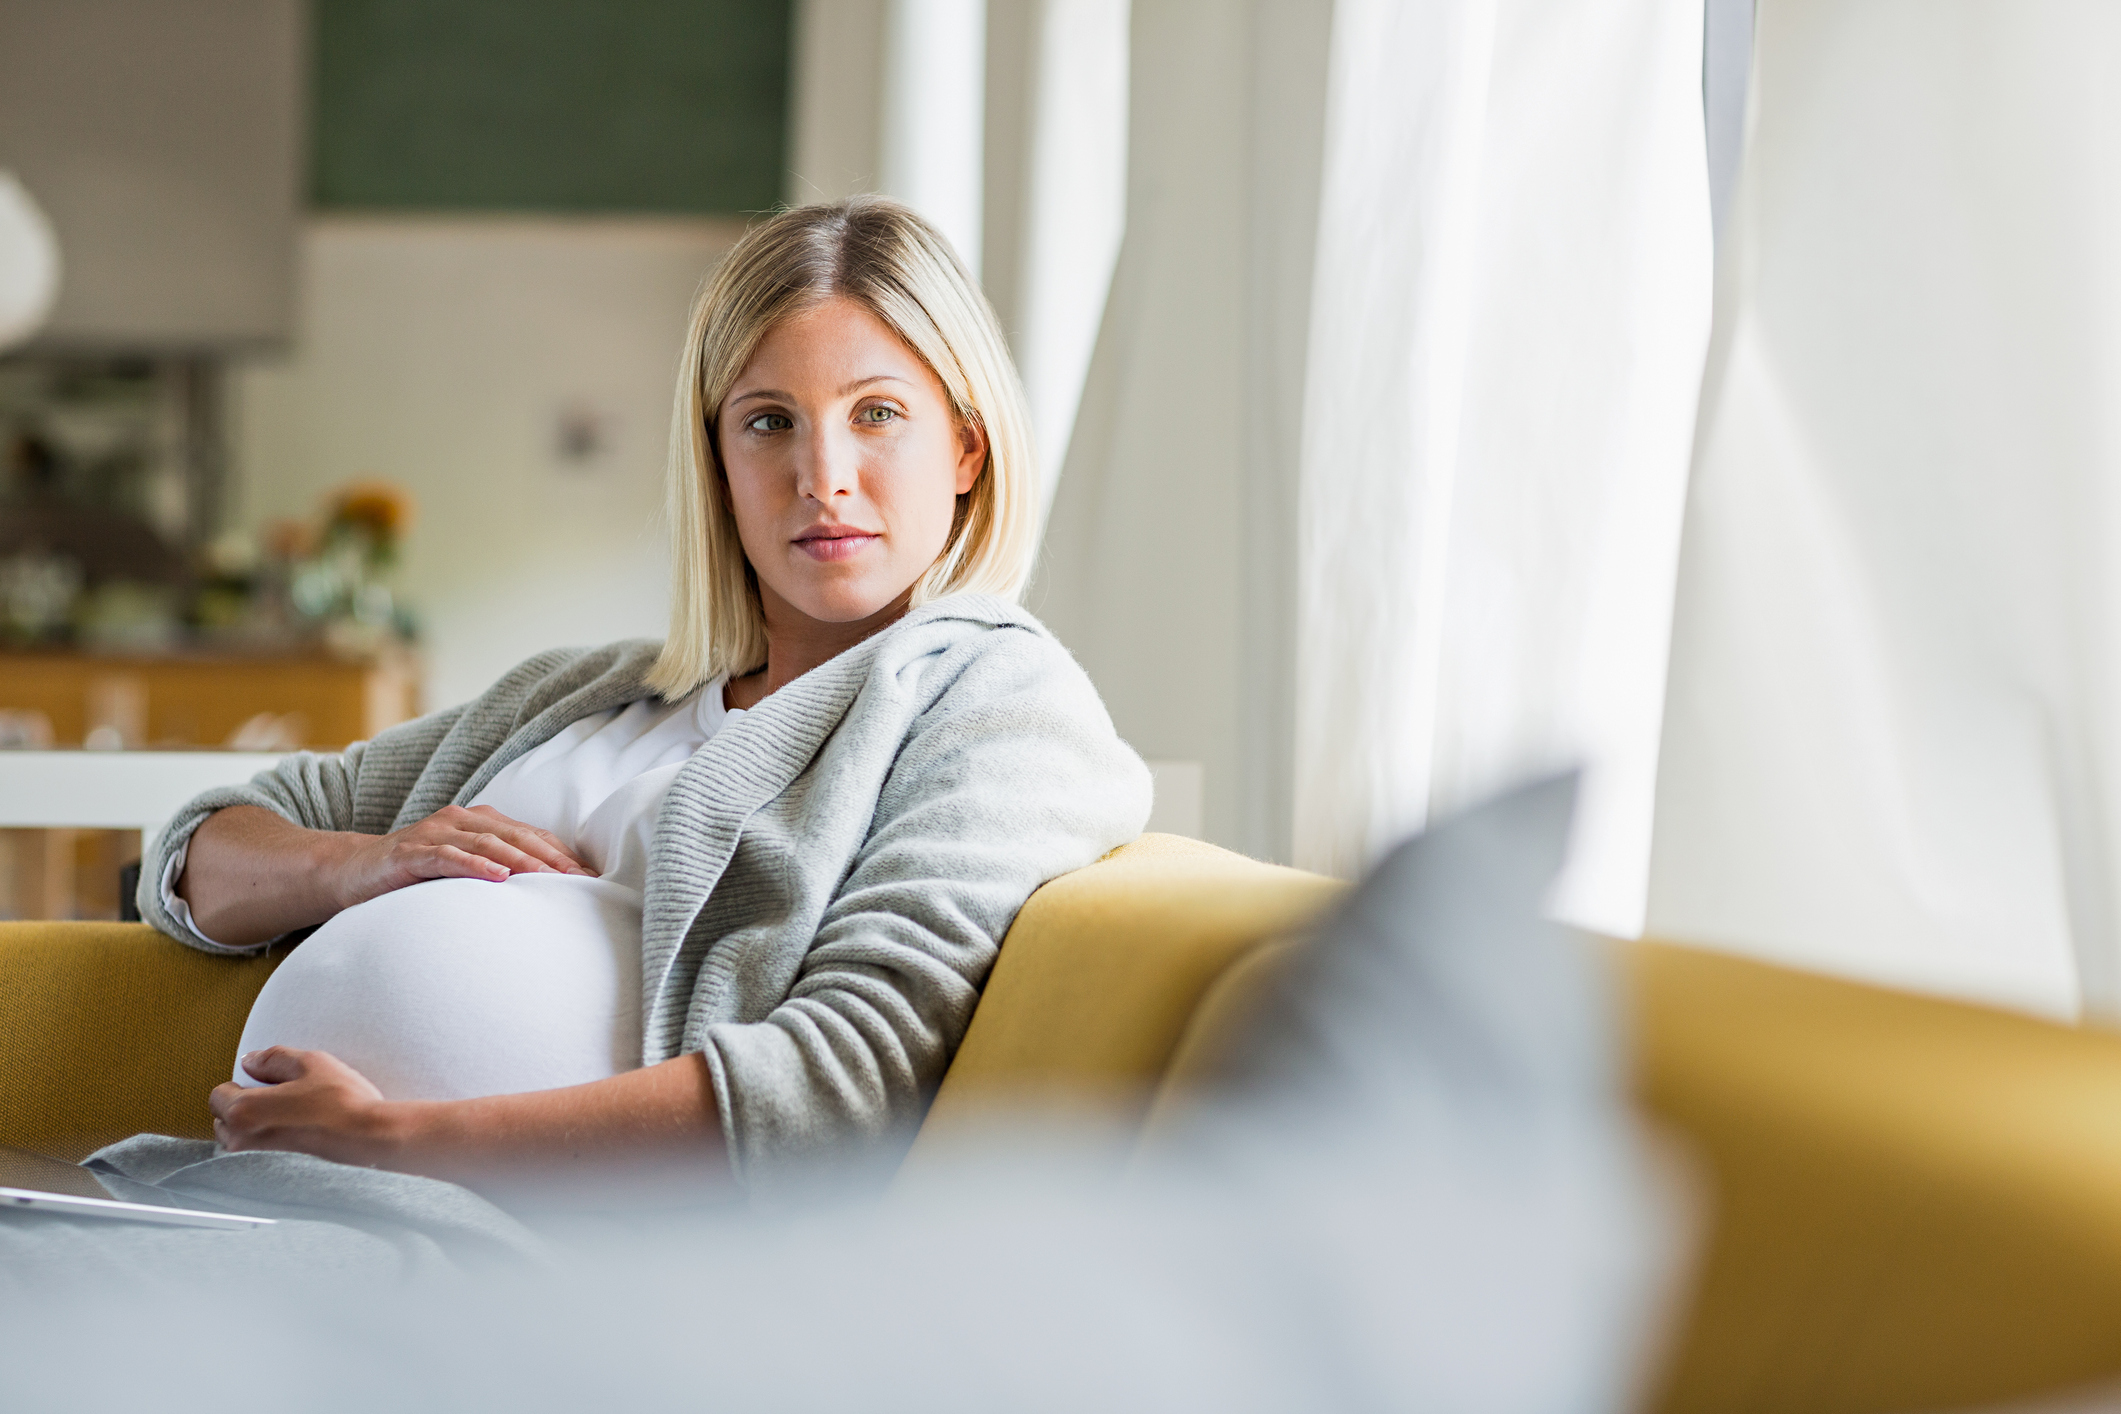 Smell urine pregnancy pee bad drinking hold pregnant making prenatal